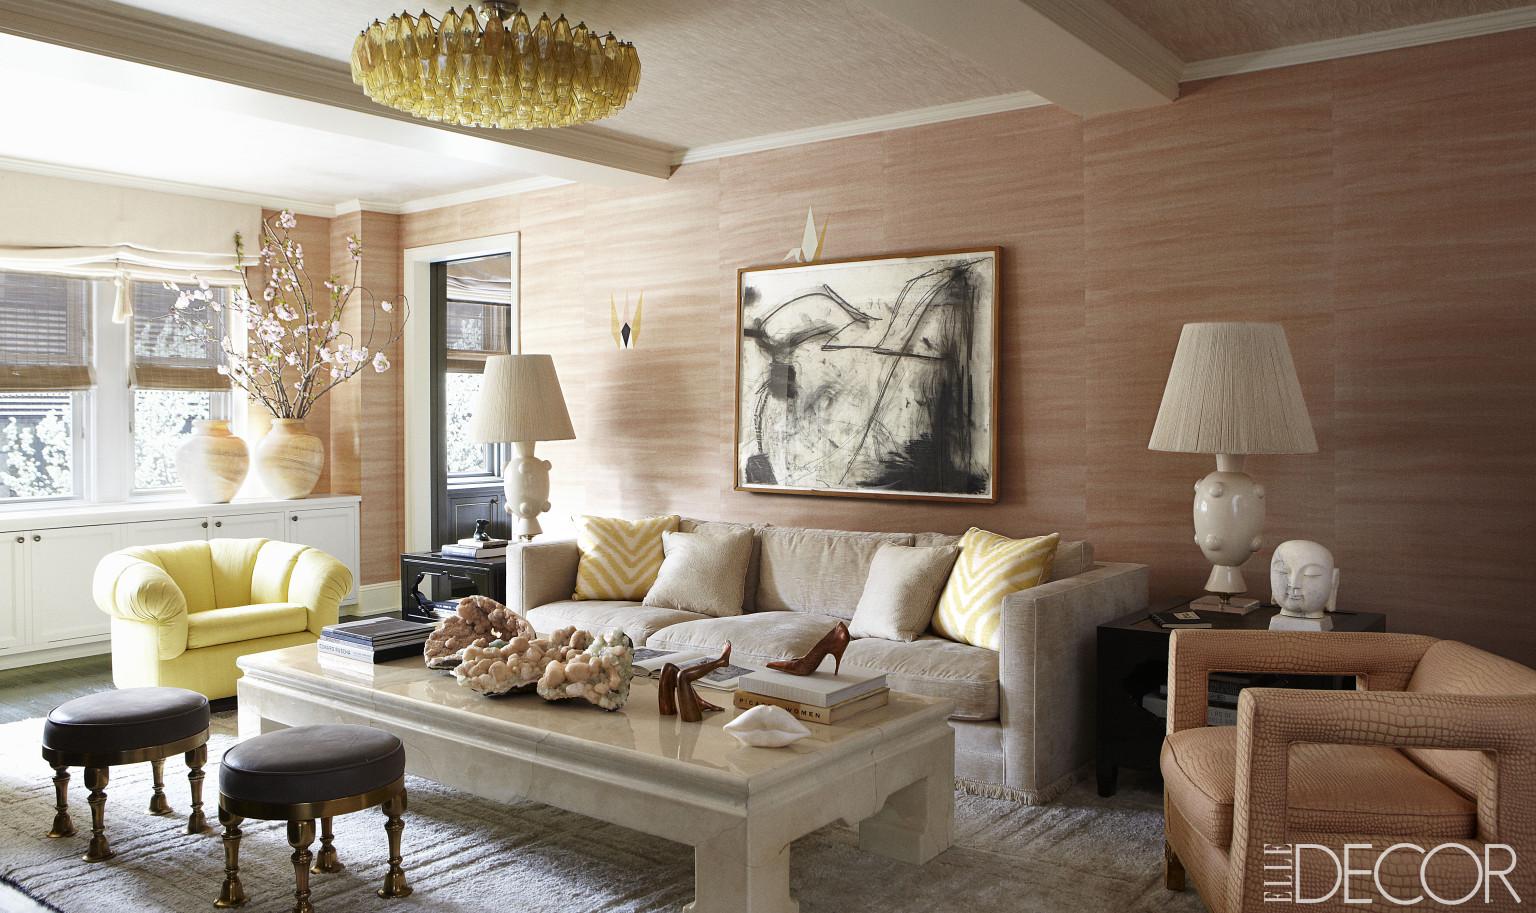 Cameron Diaz Reveals Luxury New York Apartment In Elle Decor